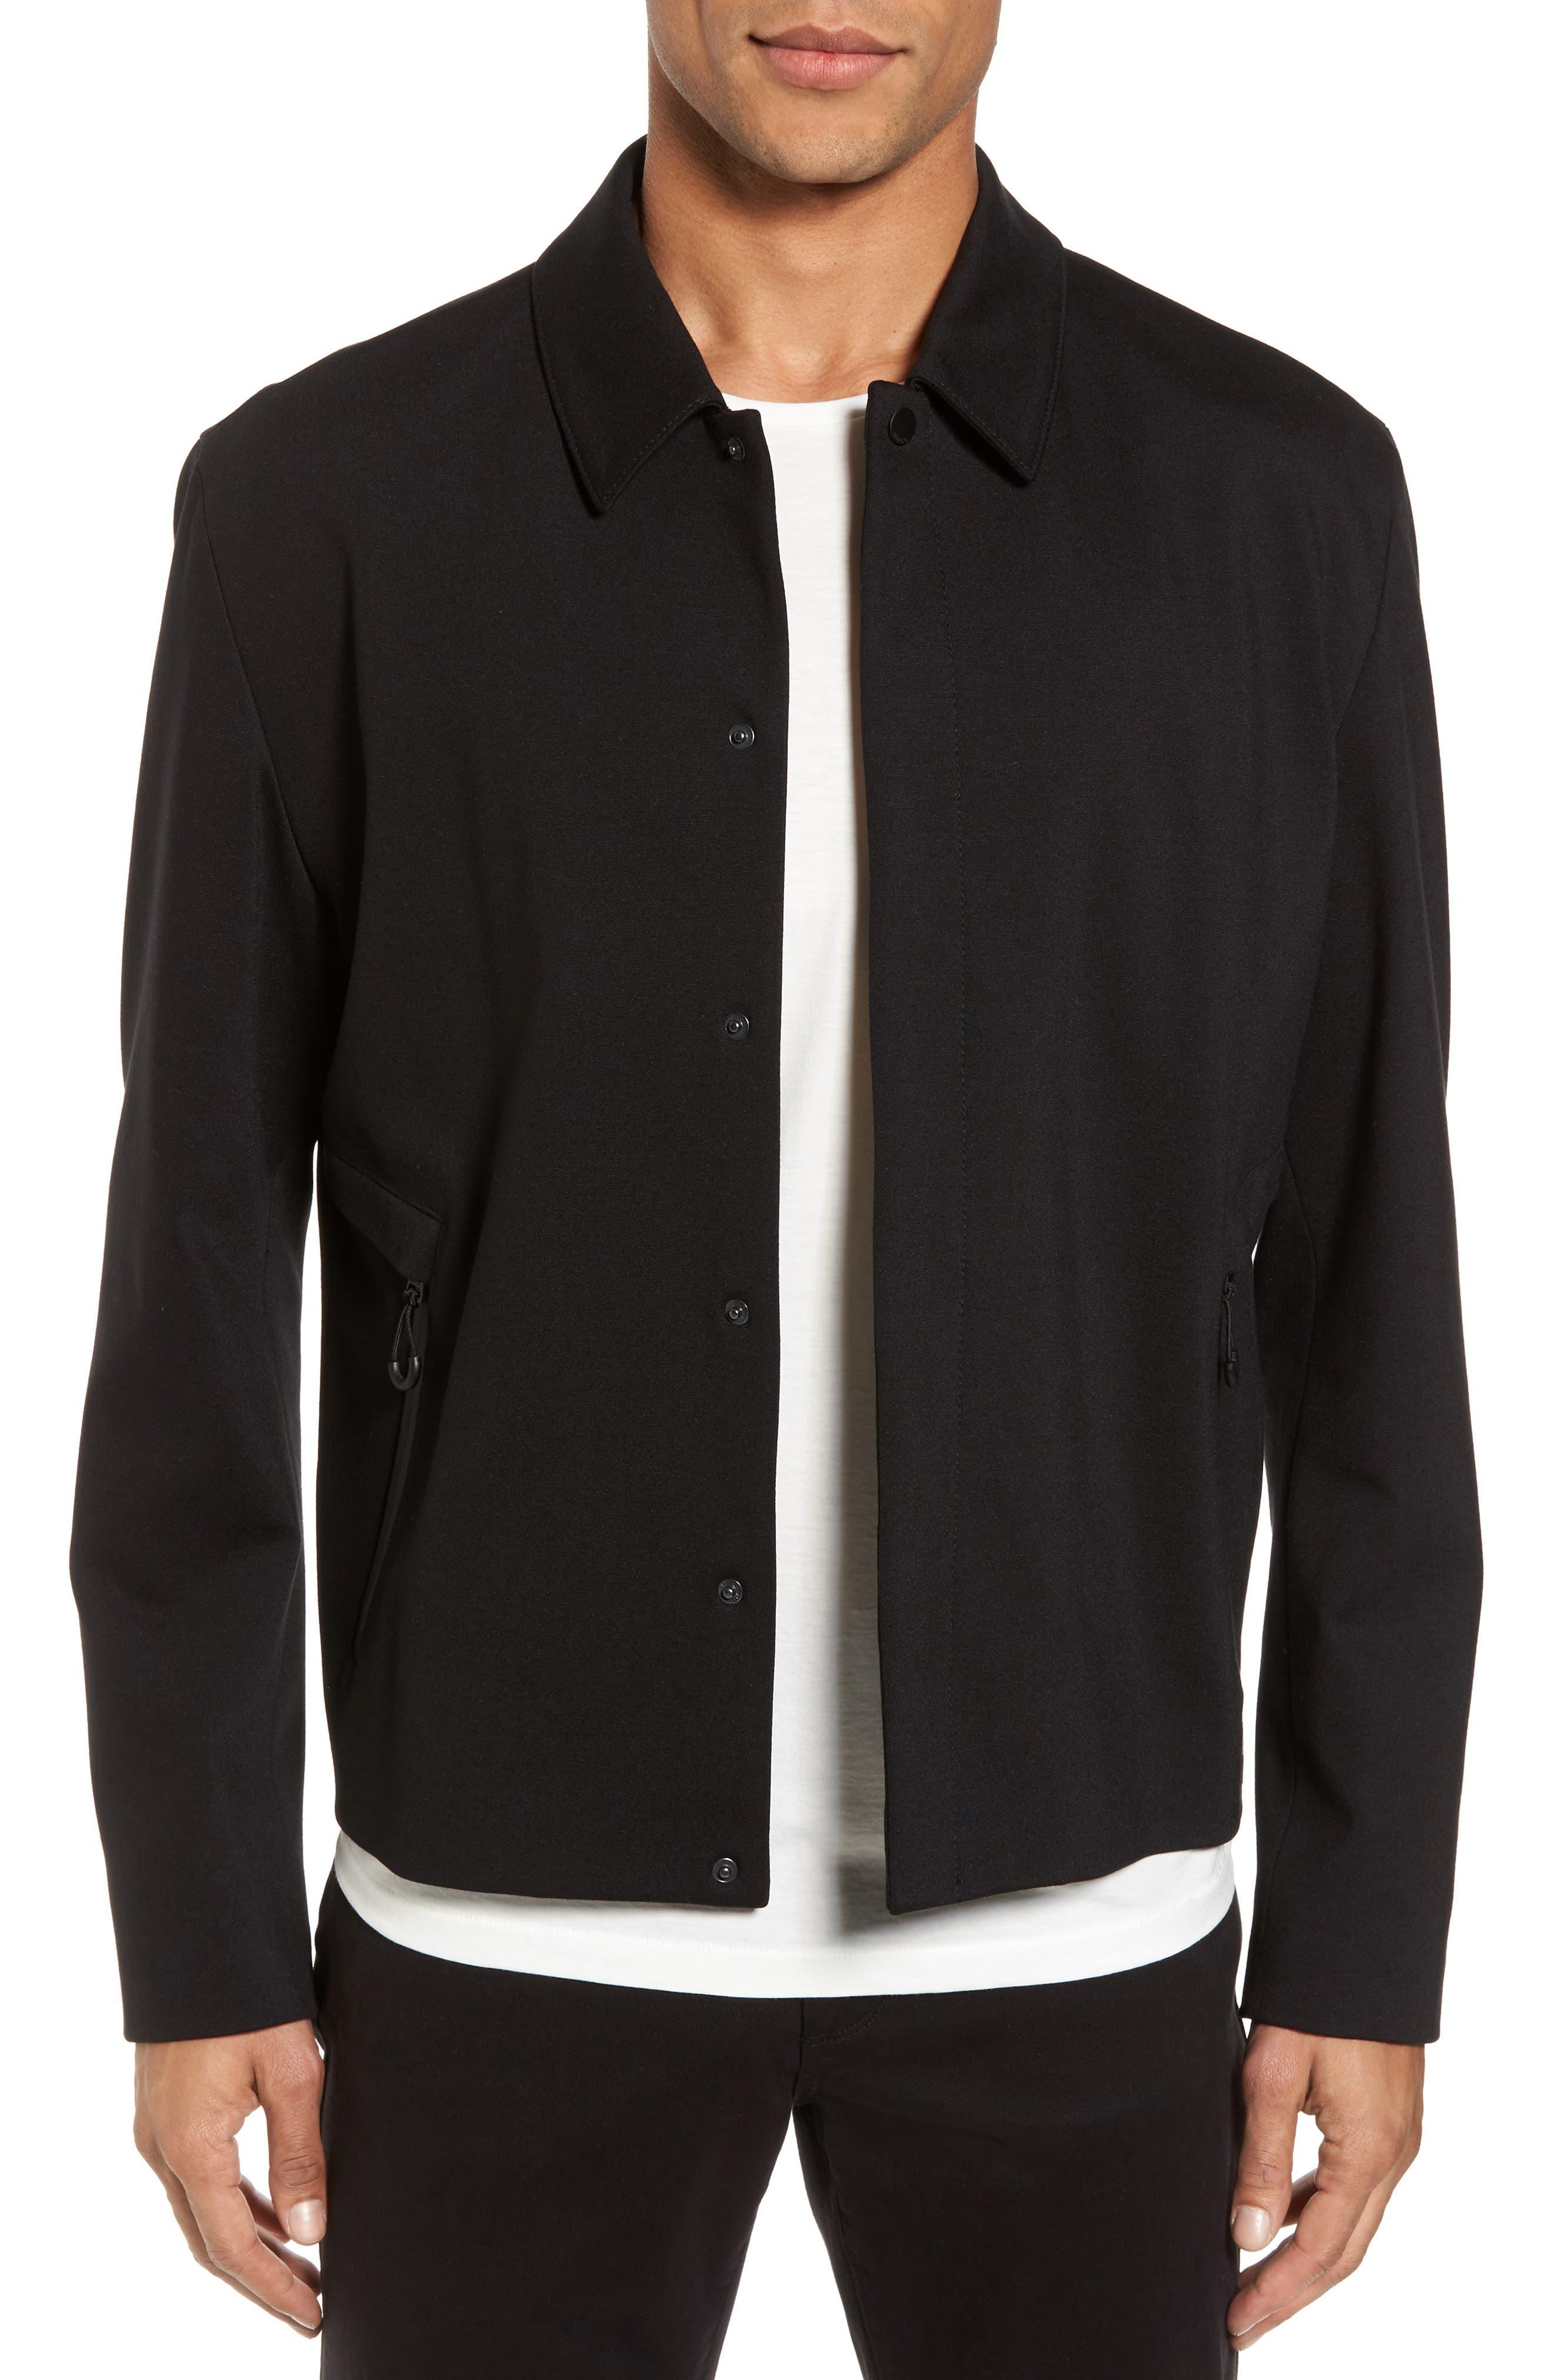 Hugo Boss Babenu Shirt Jacket,                         Main,                         color, Black